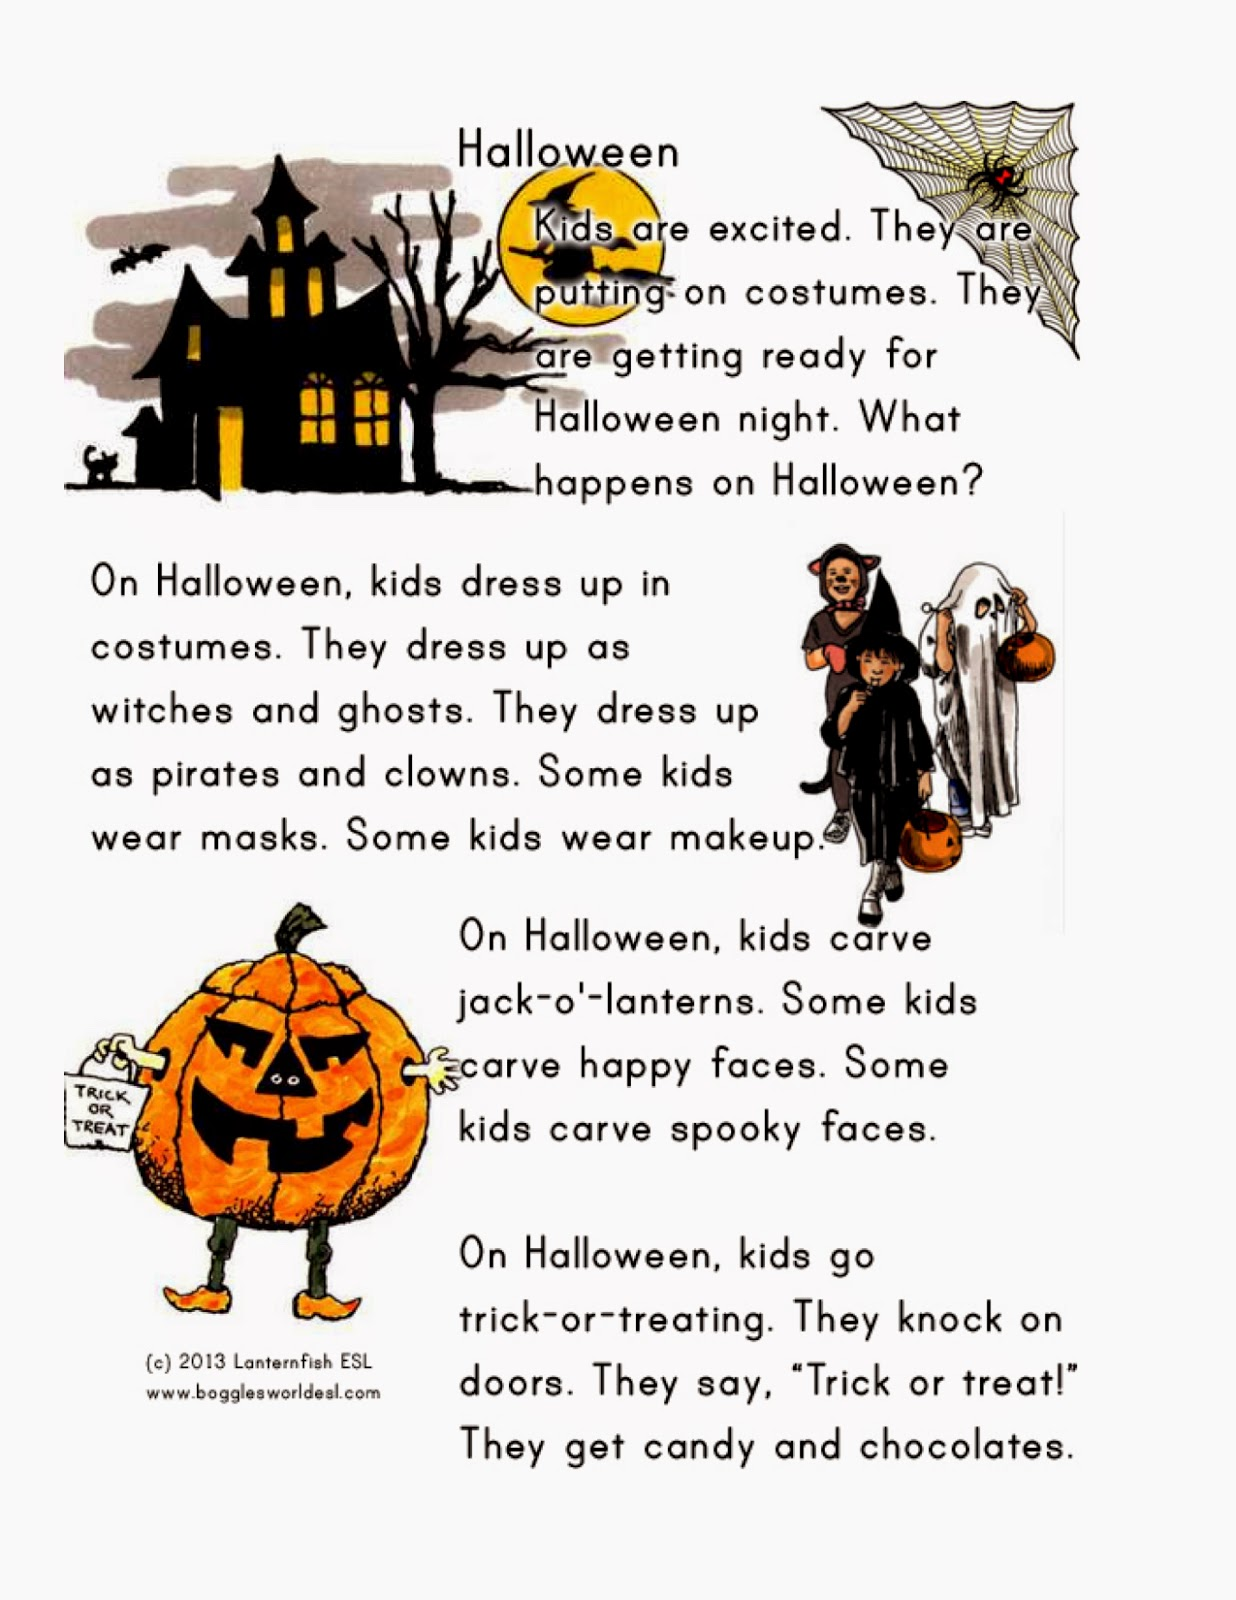 Language To Go! : Halloween games